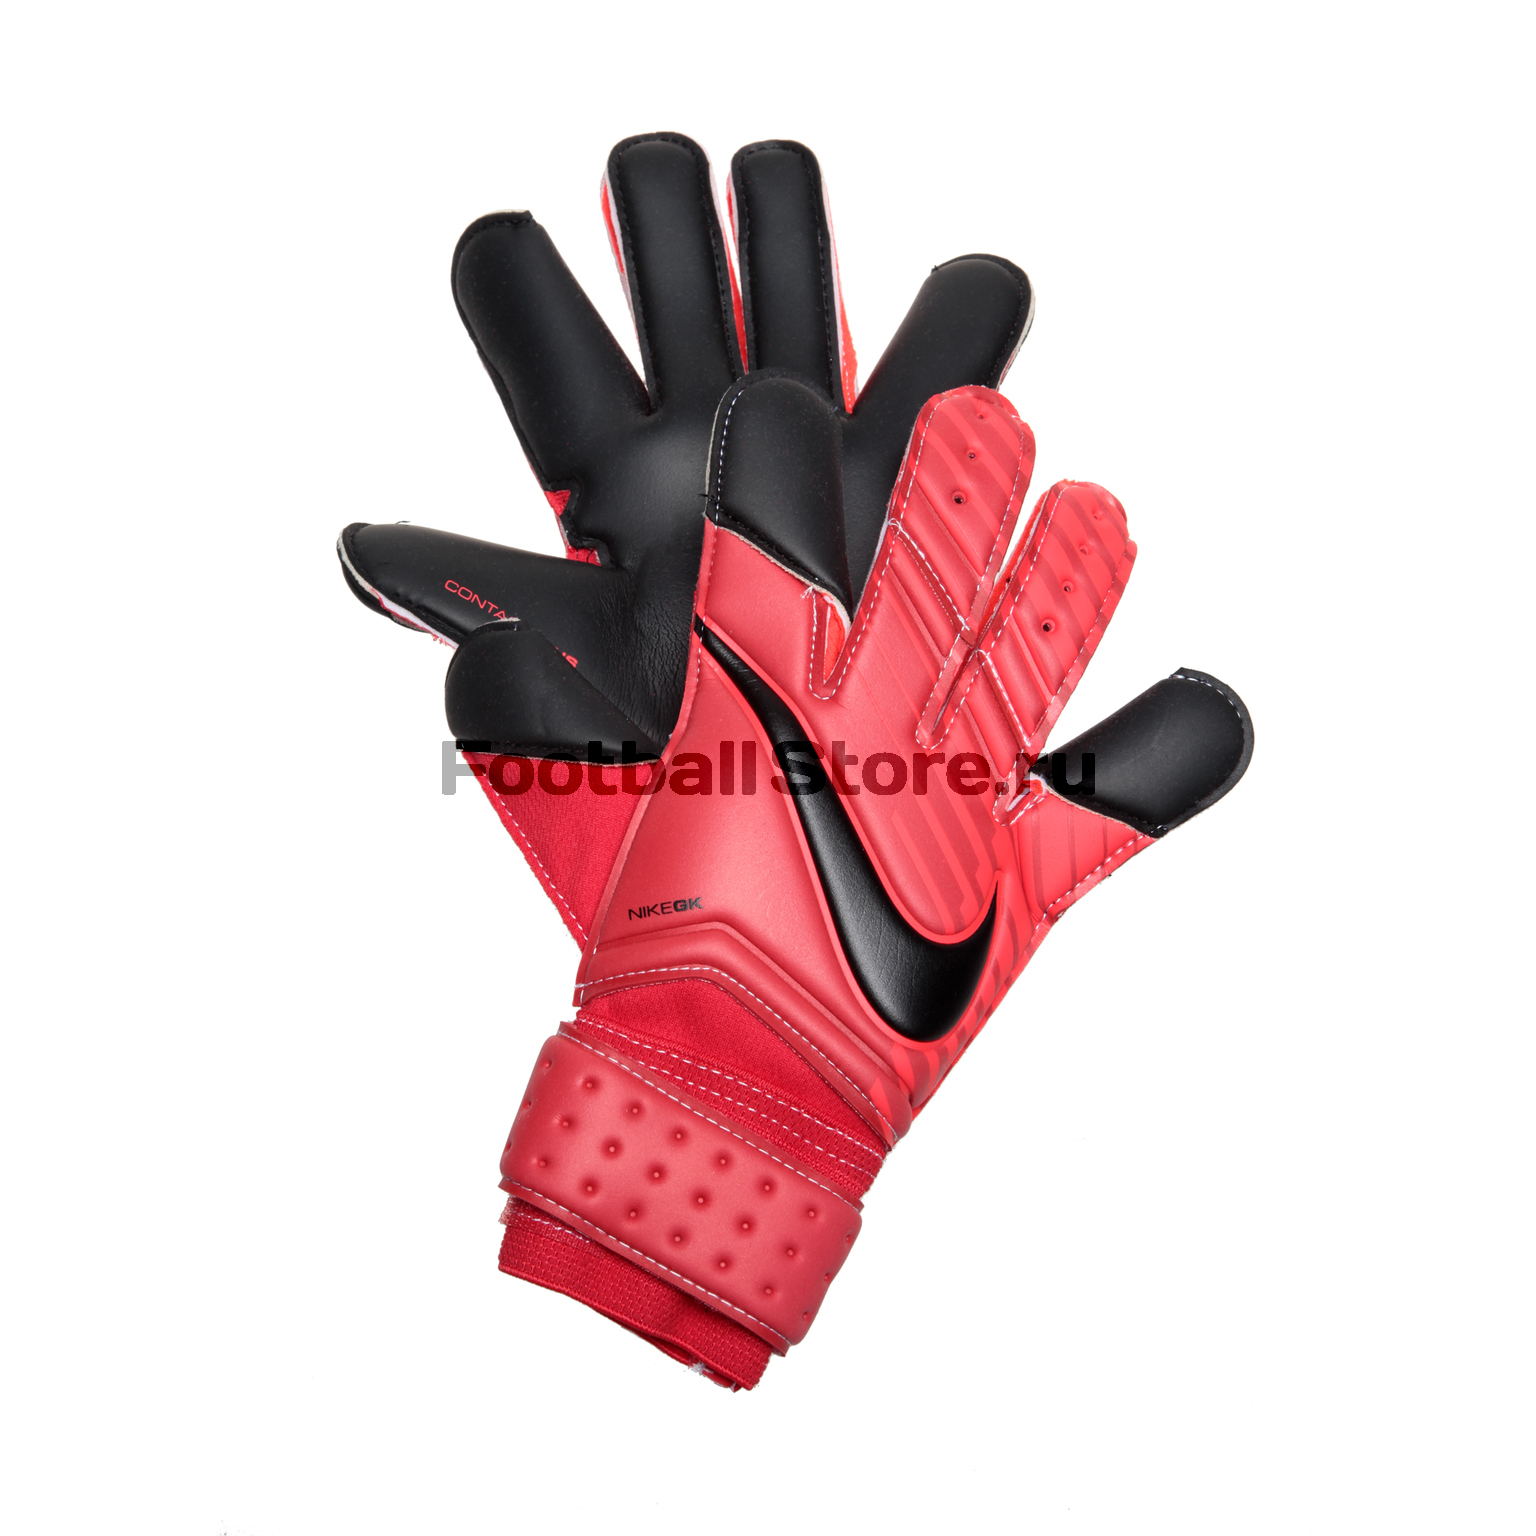 Перчатки Nike Перчатки вратарские Nike GK Vapor GS0347-657